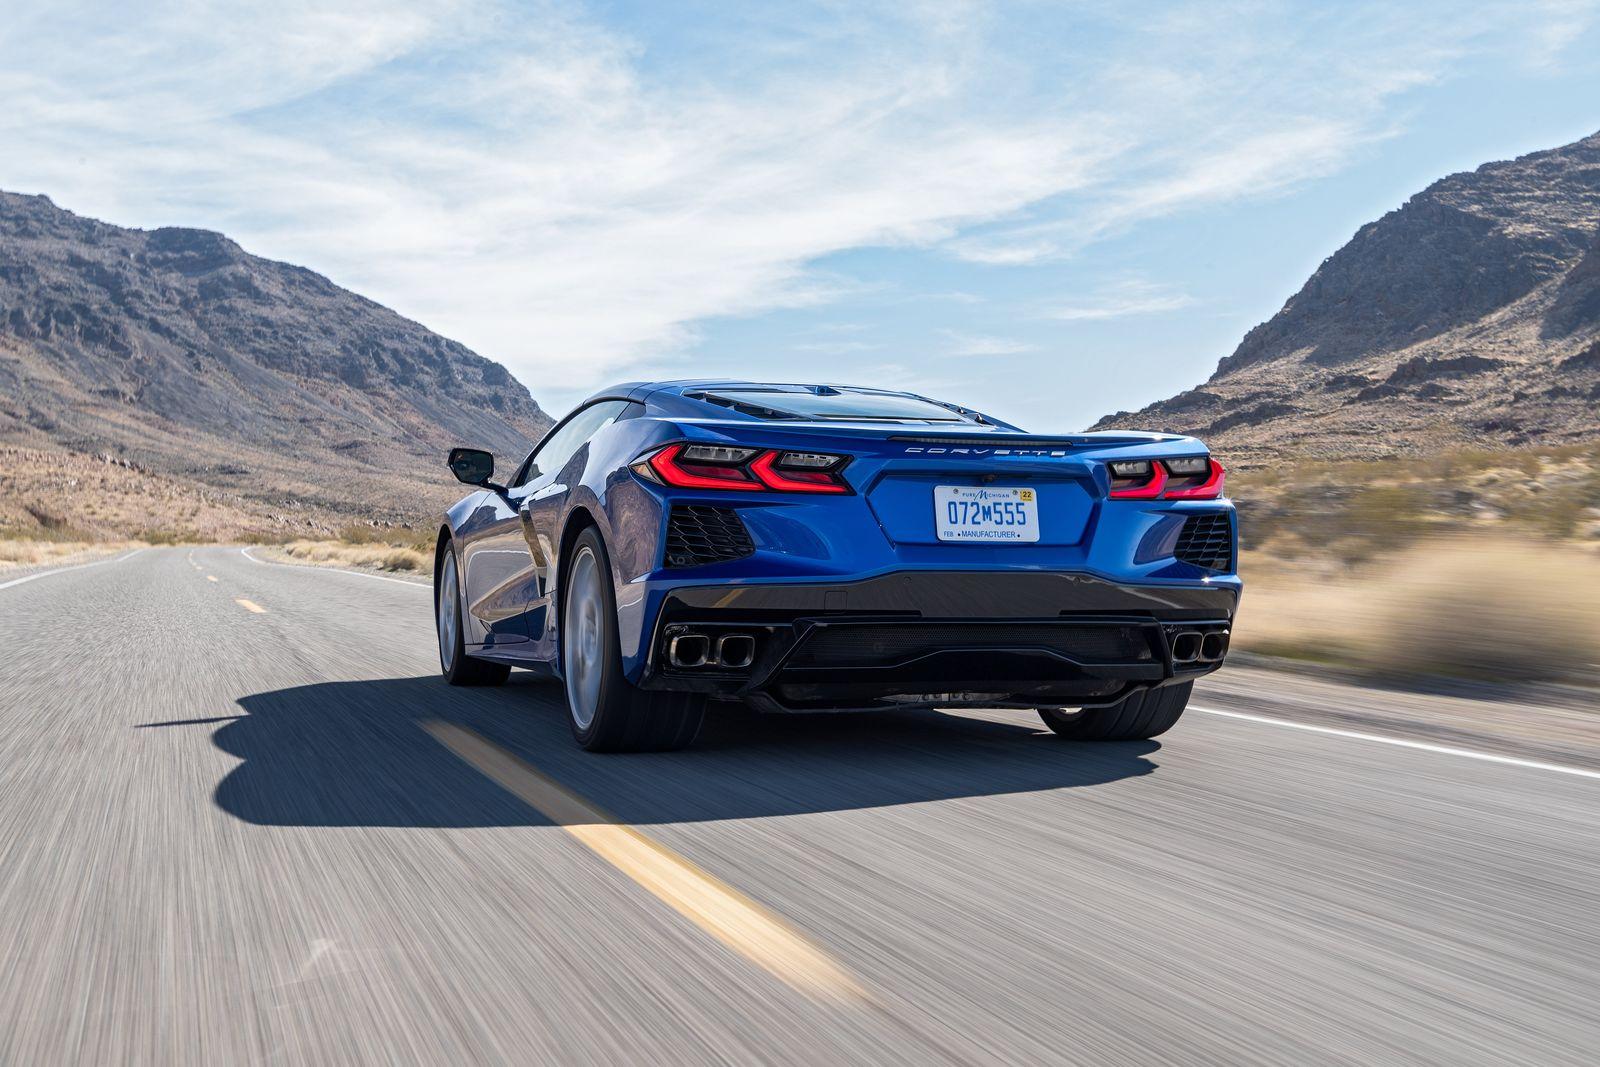 2020-Corvette-D55_0096